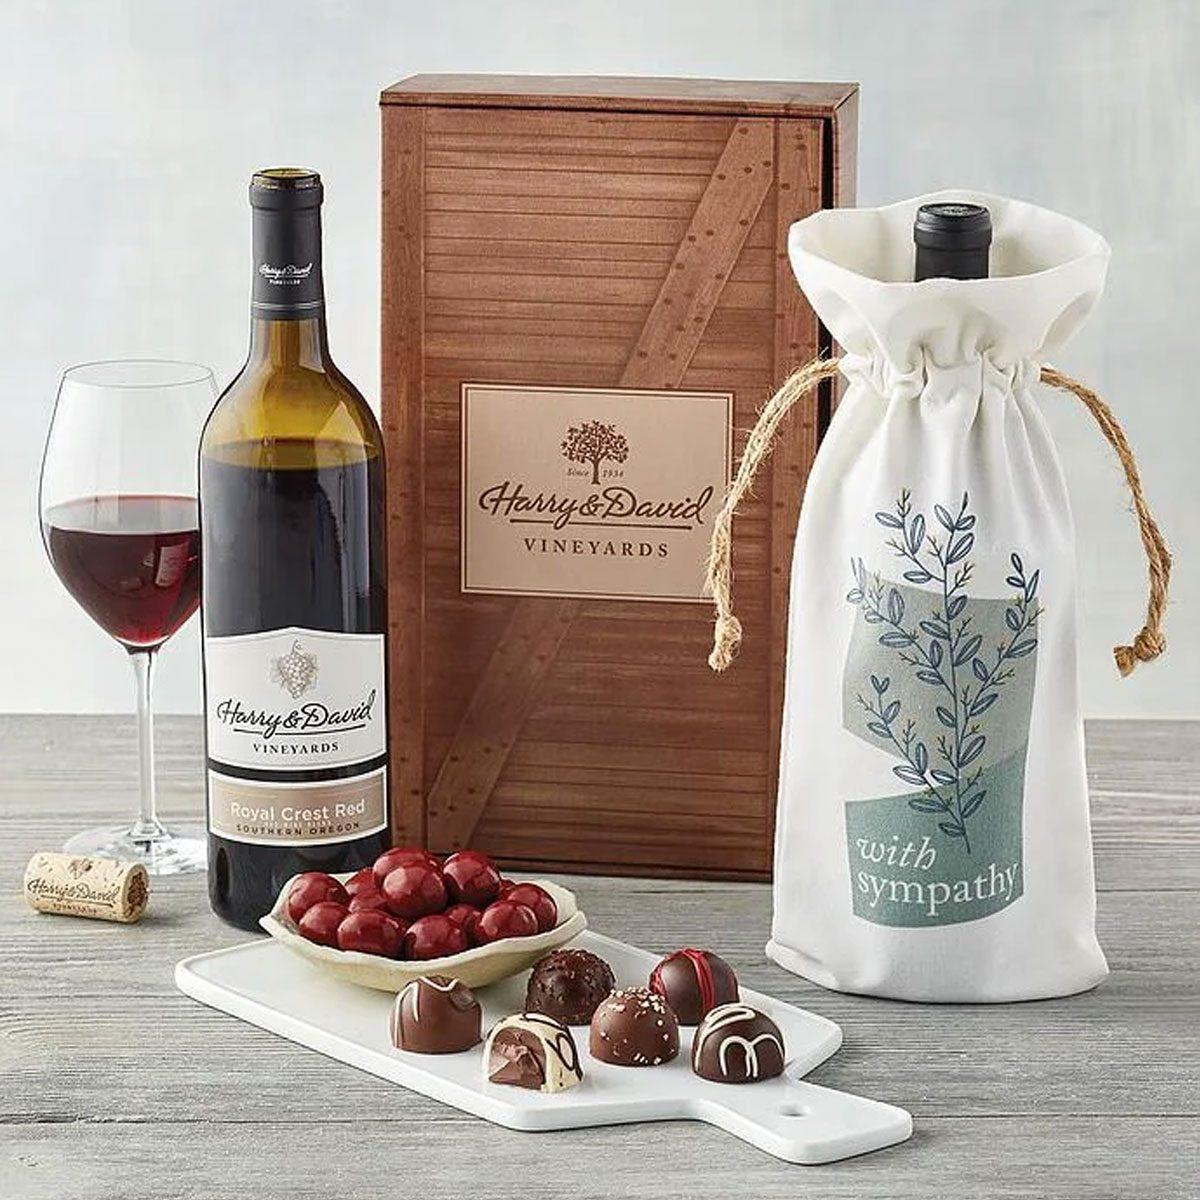 Sympathy Red Wine Gift Box